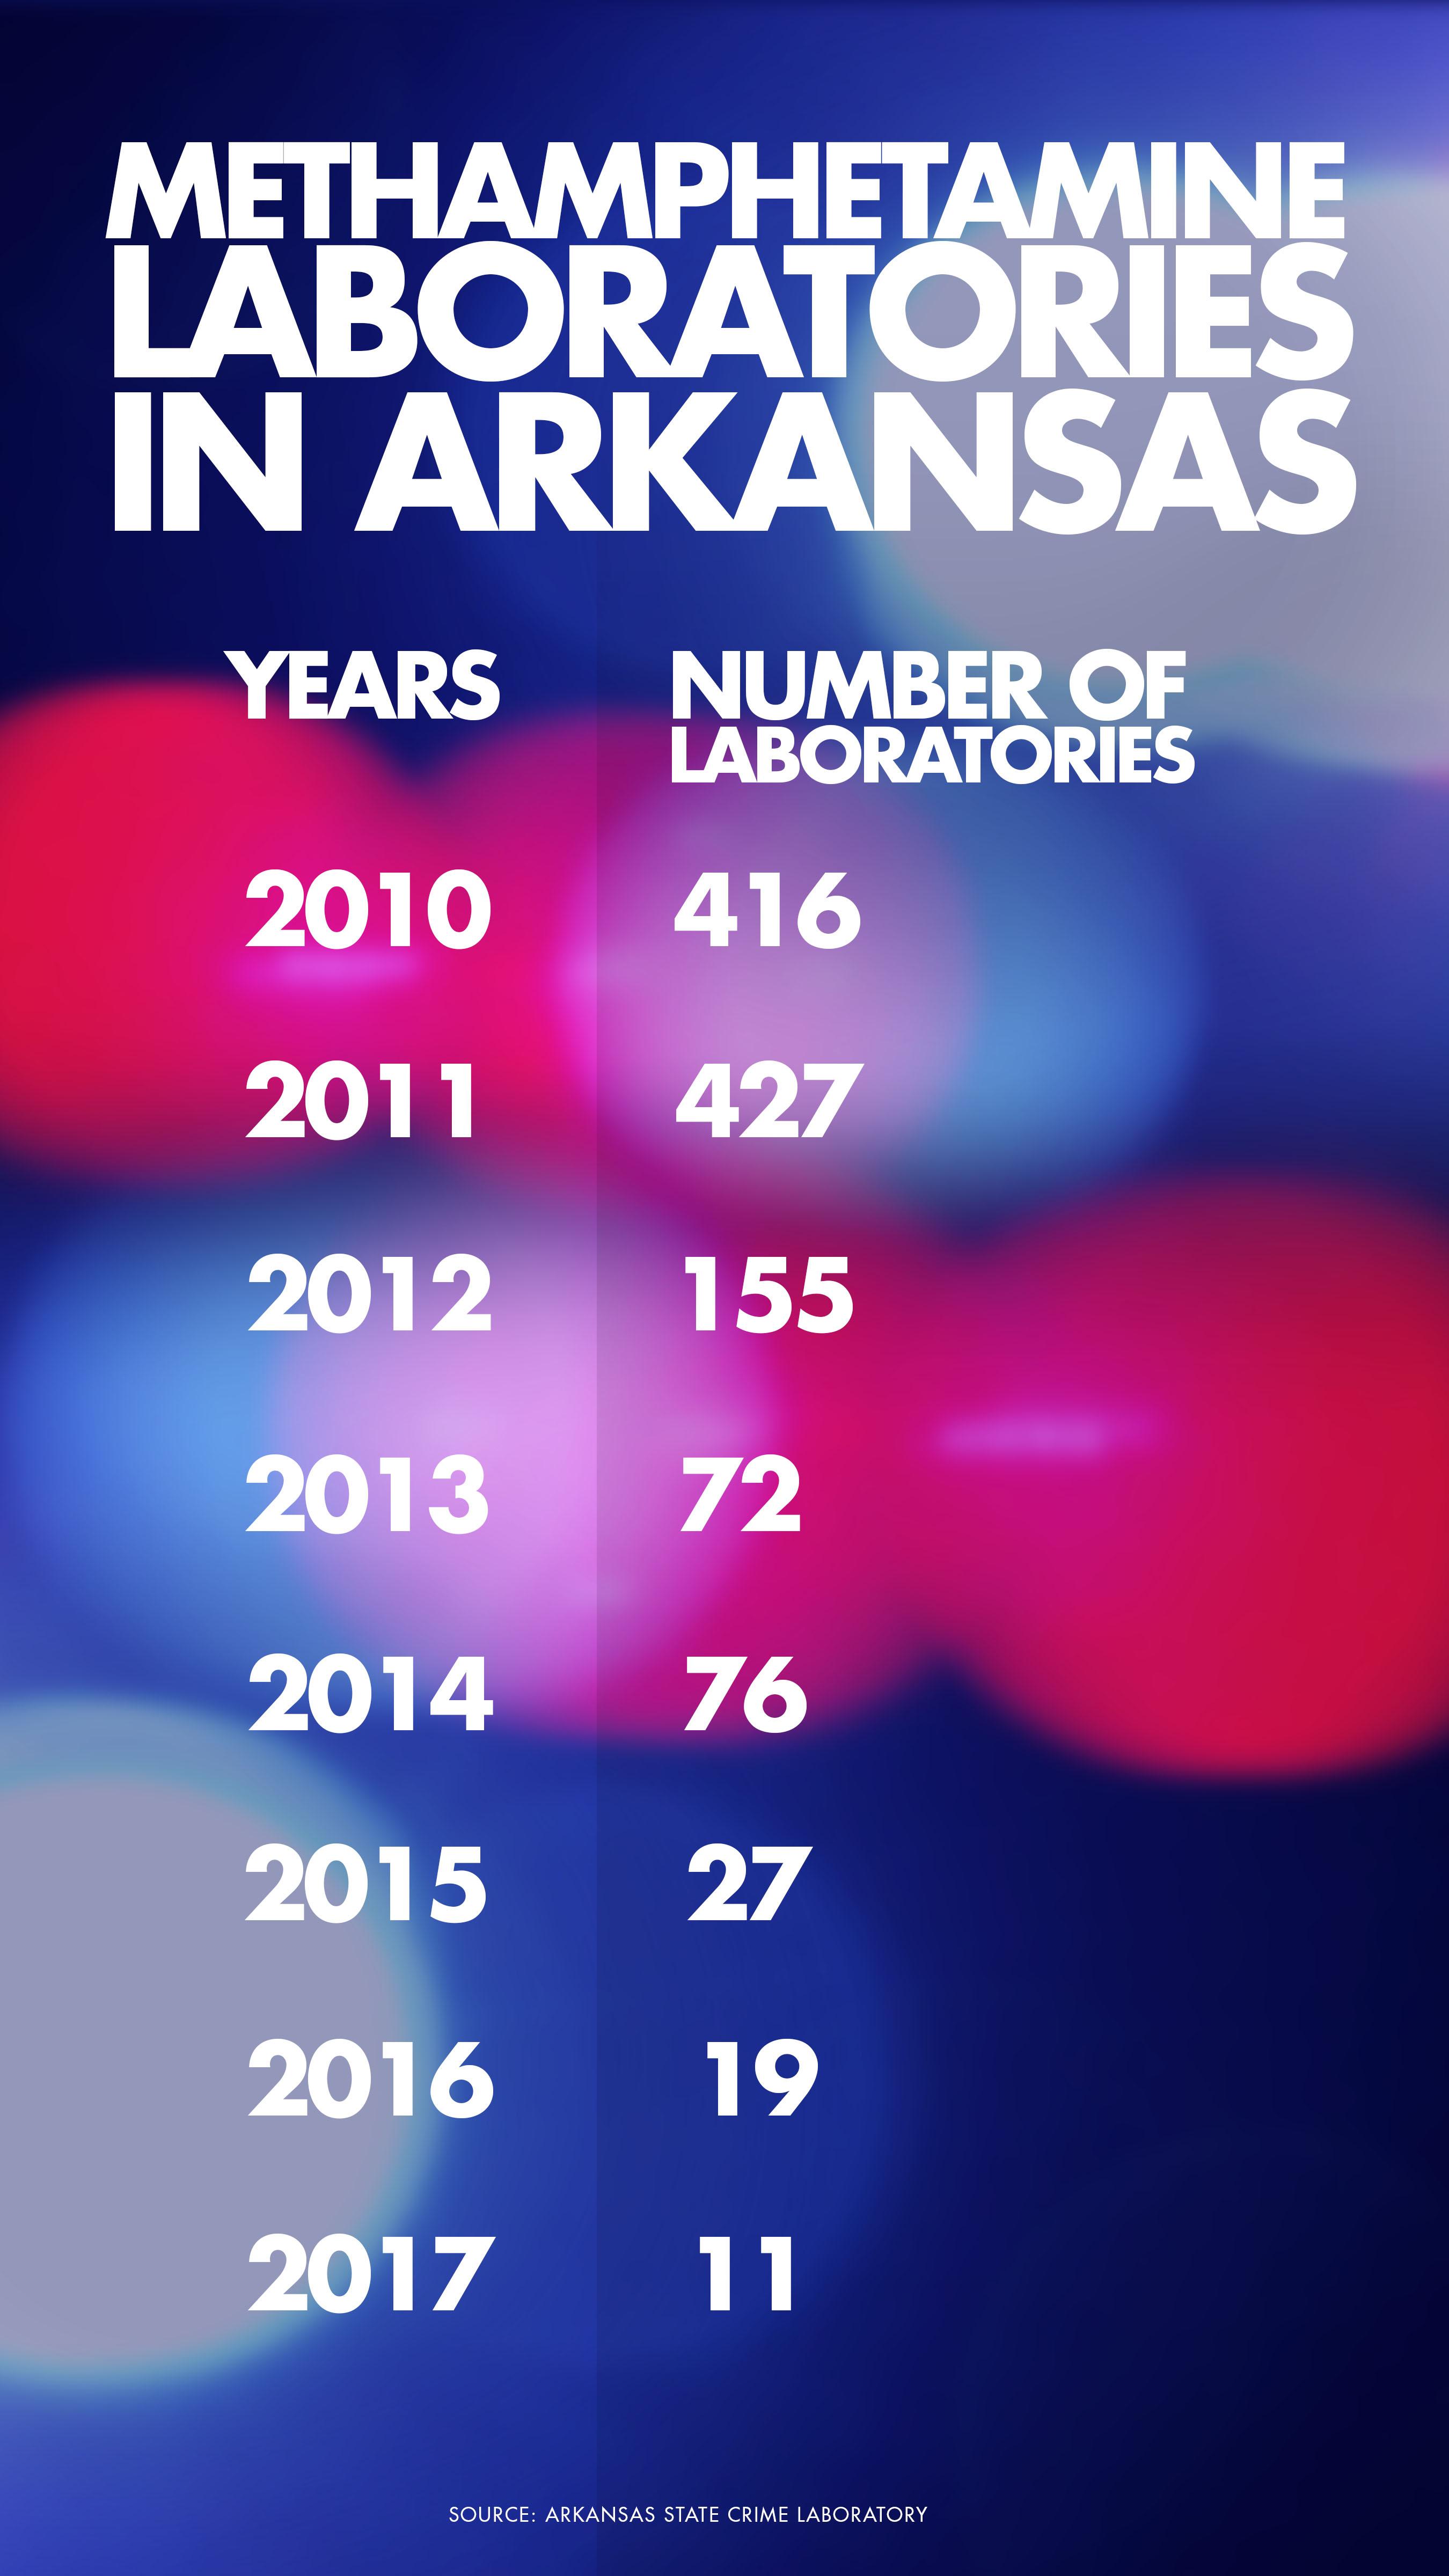 WEB EXTRA: Arkansas' Methamphetamine Problem by the Numbers